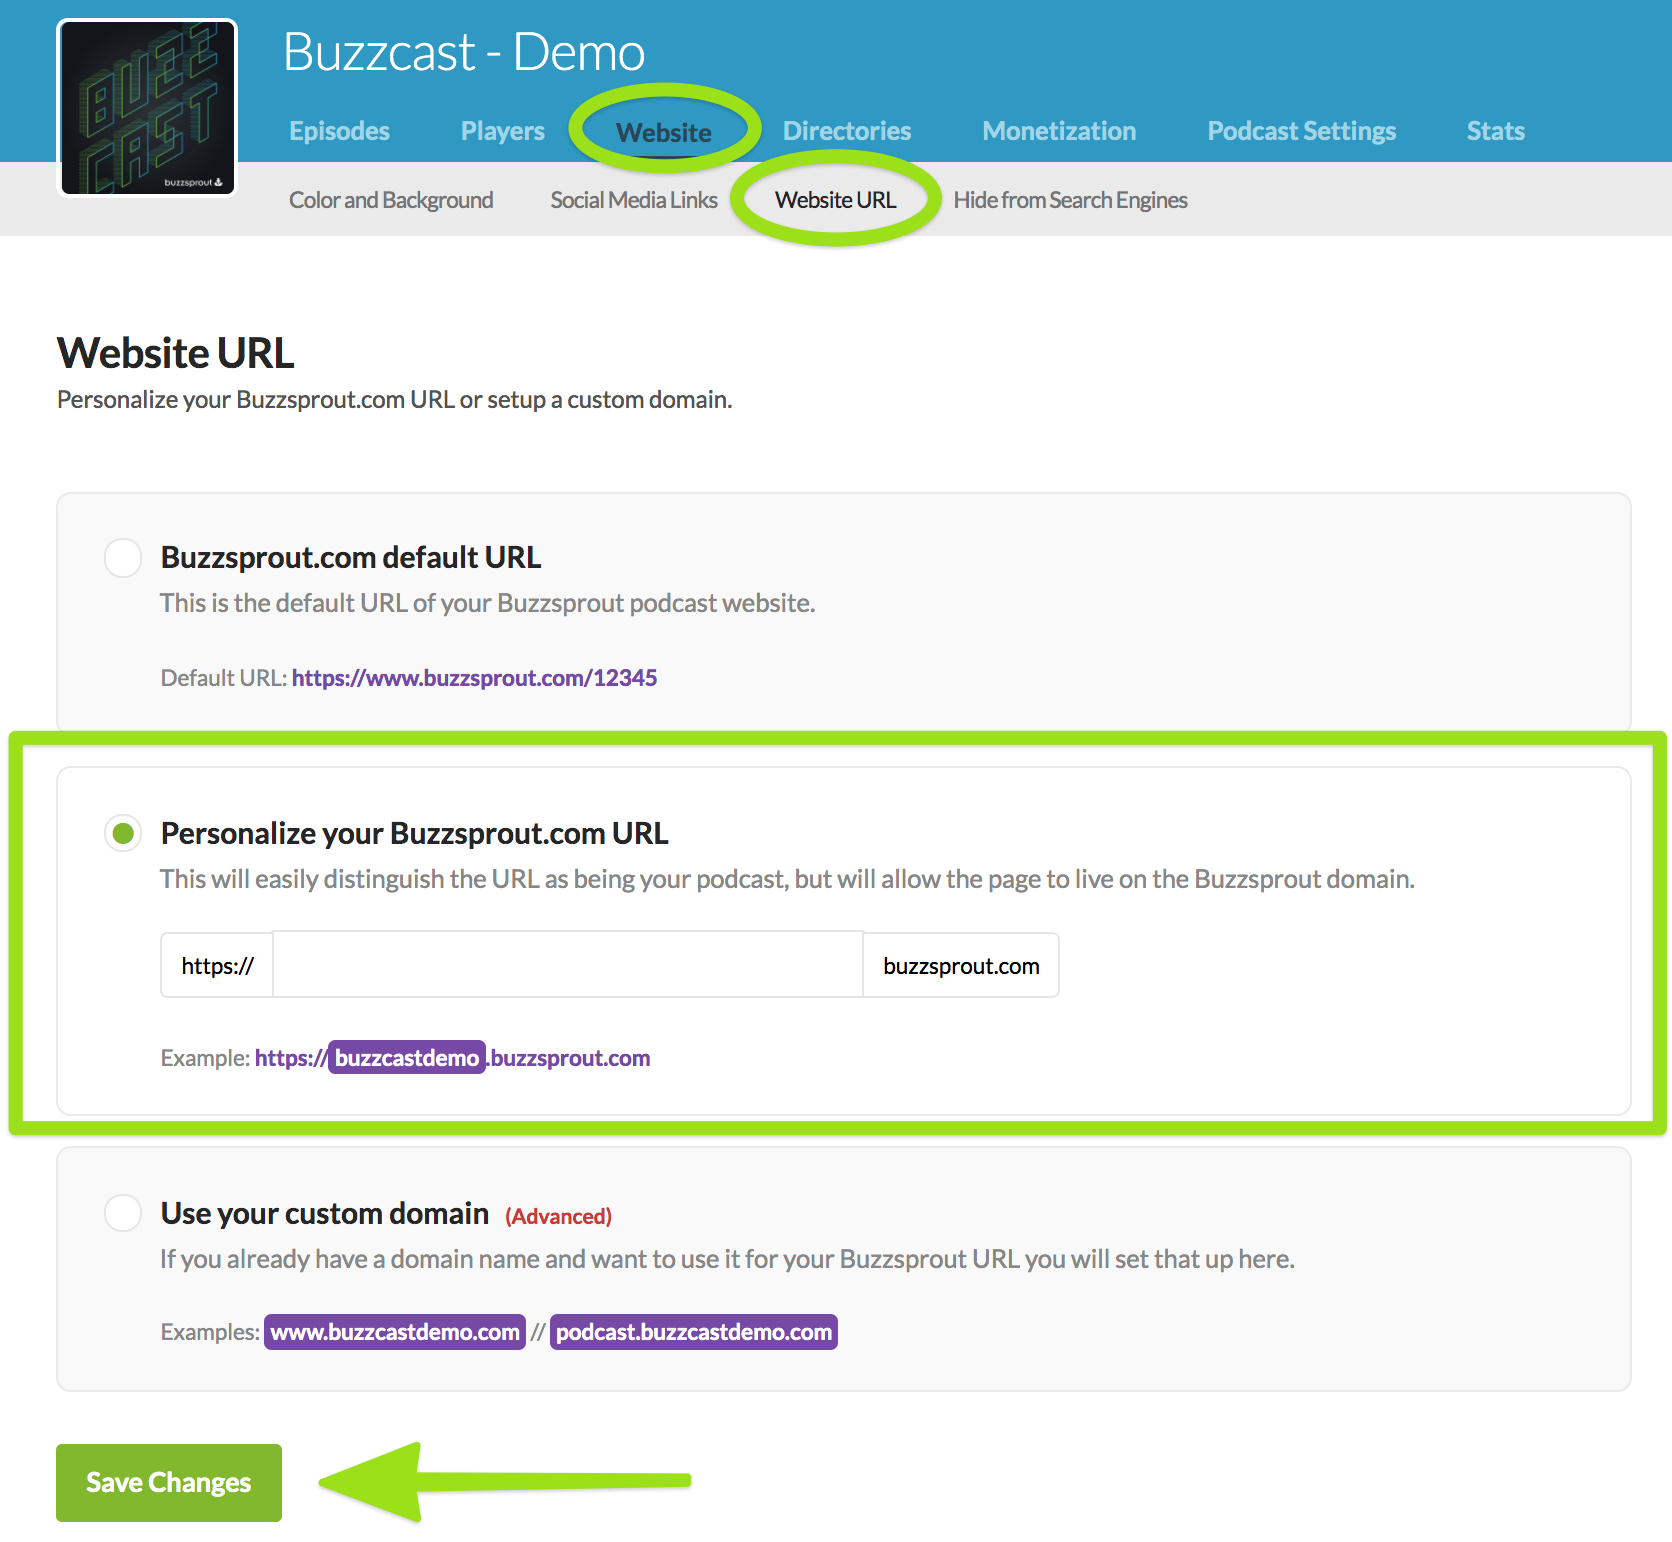 Customize your Buzzsprout Website URL - Buzzsprout Help